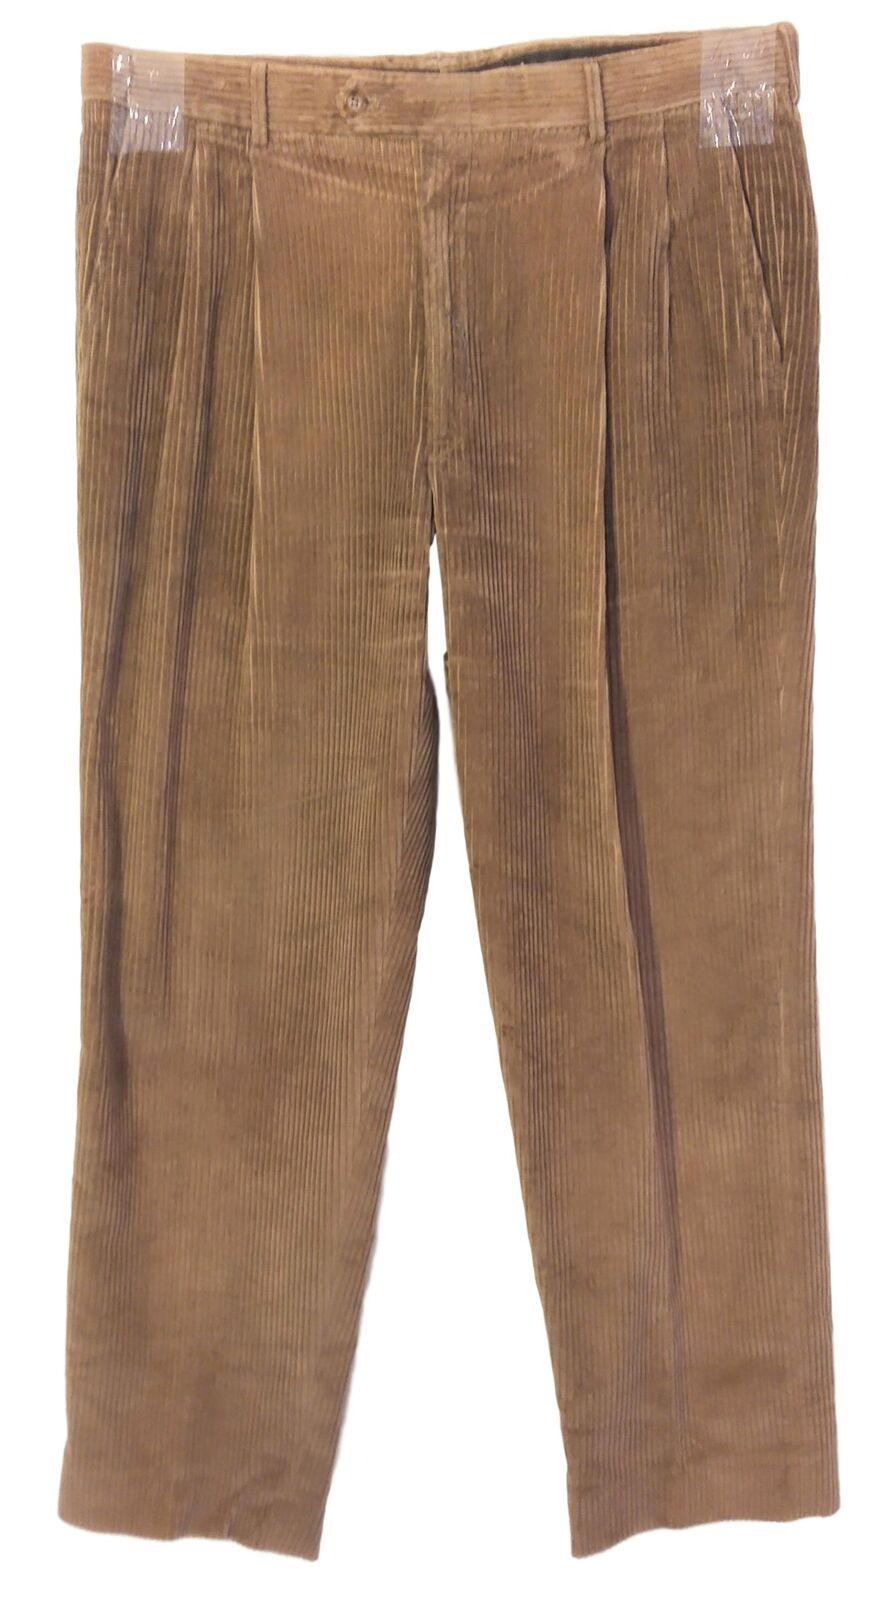 NEW Saks Fifth Avenue Straight Leg Corduroy Pants Mens Sz 36 x 31 - Tan C3236